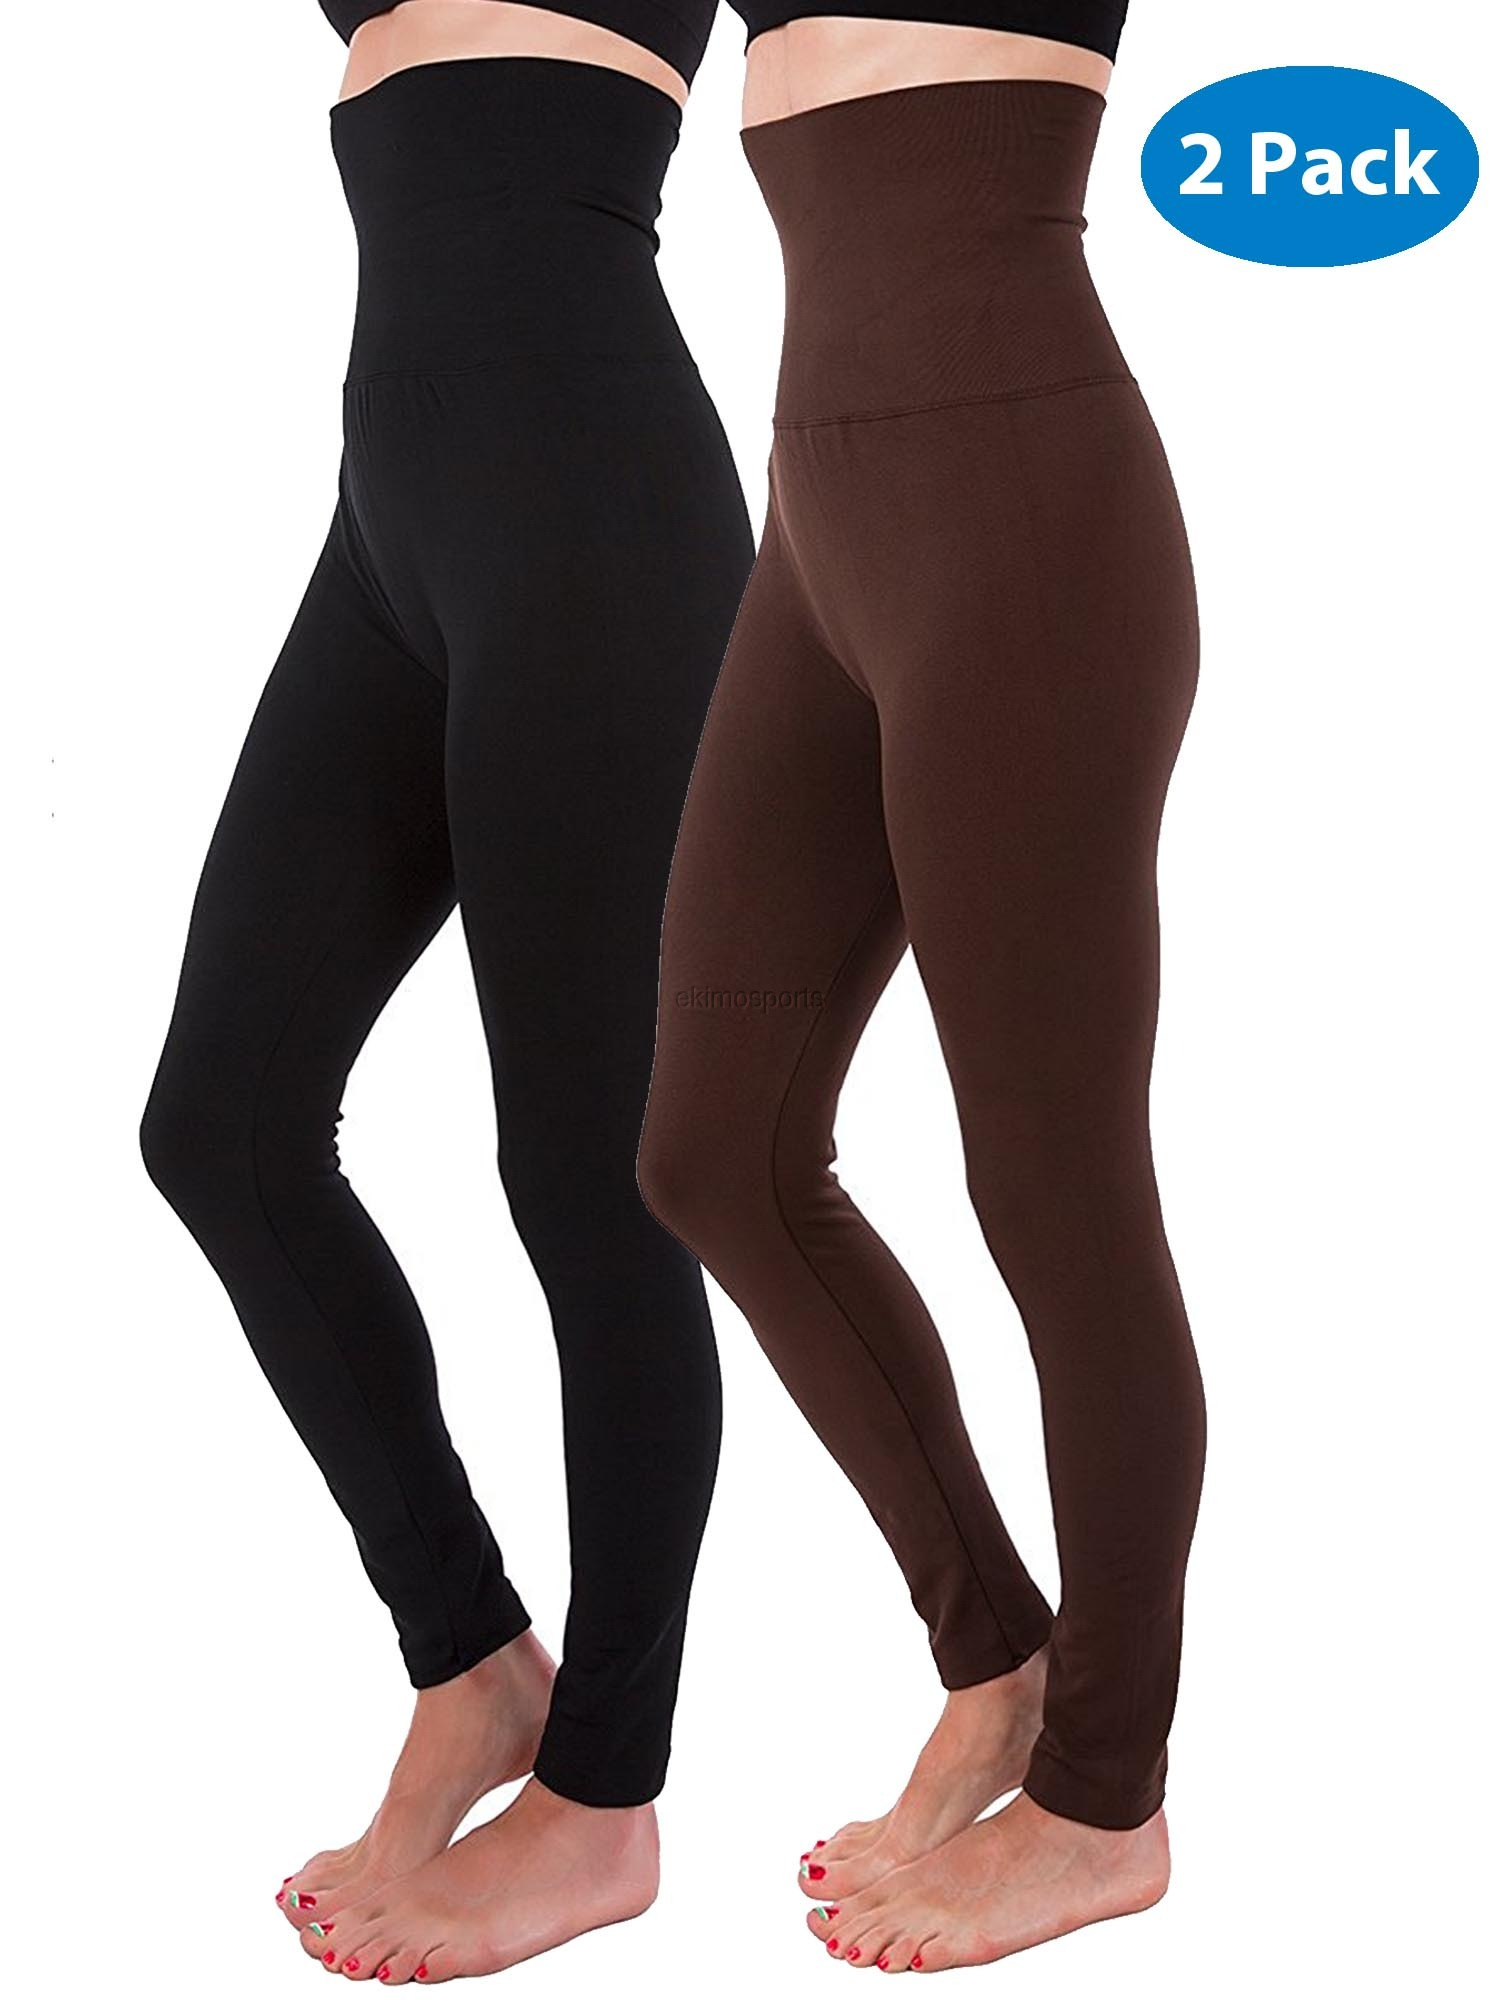 961822e15b4 N J Kuda-Moda - 2-Pack High Waist Tummy Control Full Length Legging  Compression Top Pants Fleece Lined - Walmart.com